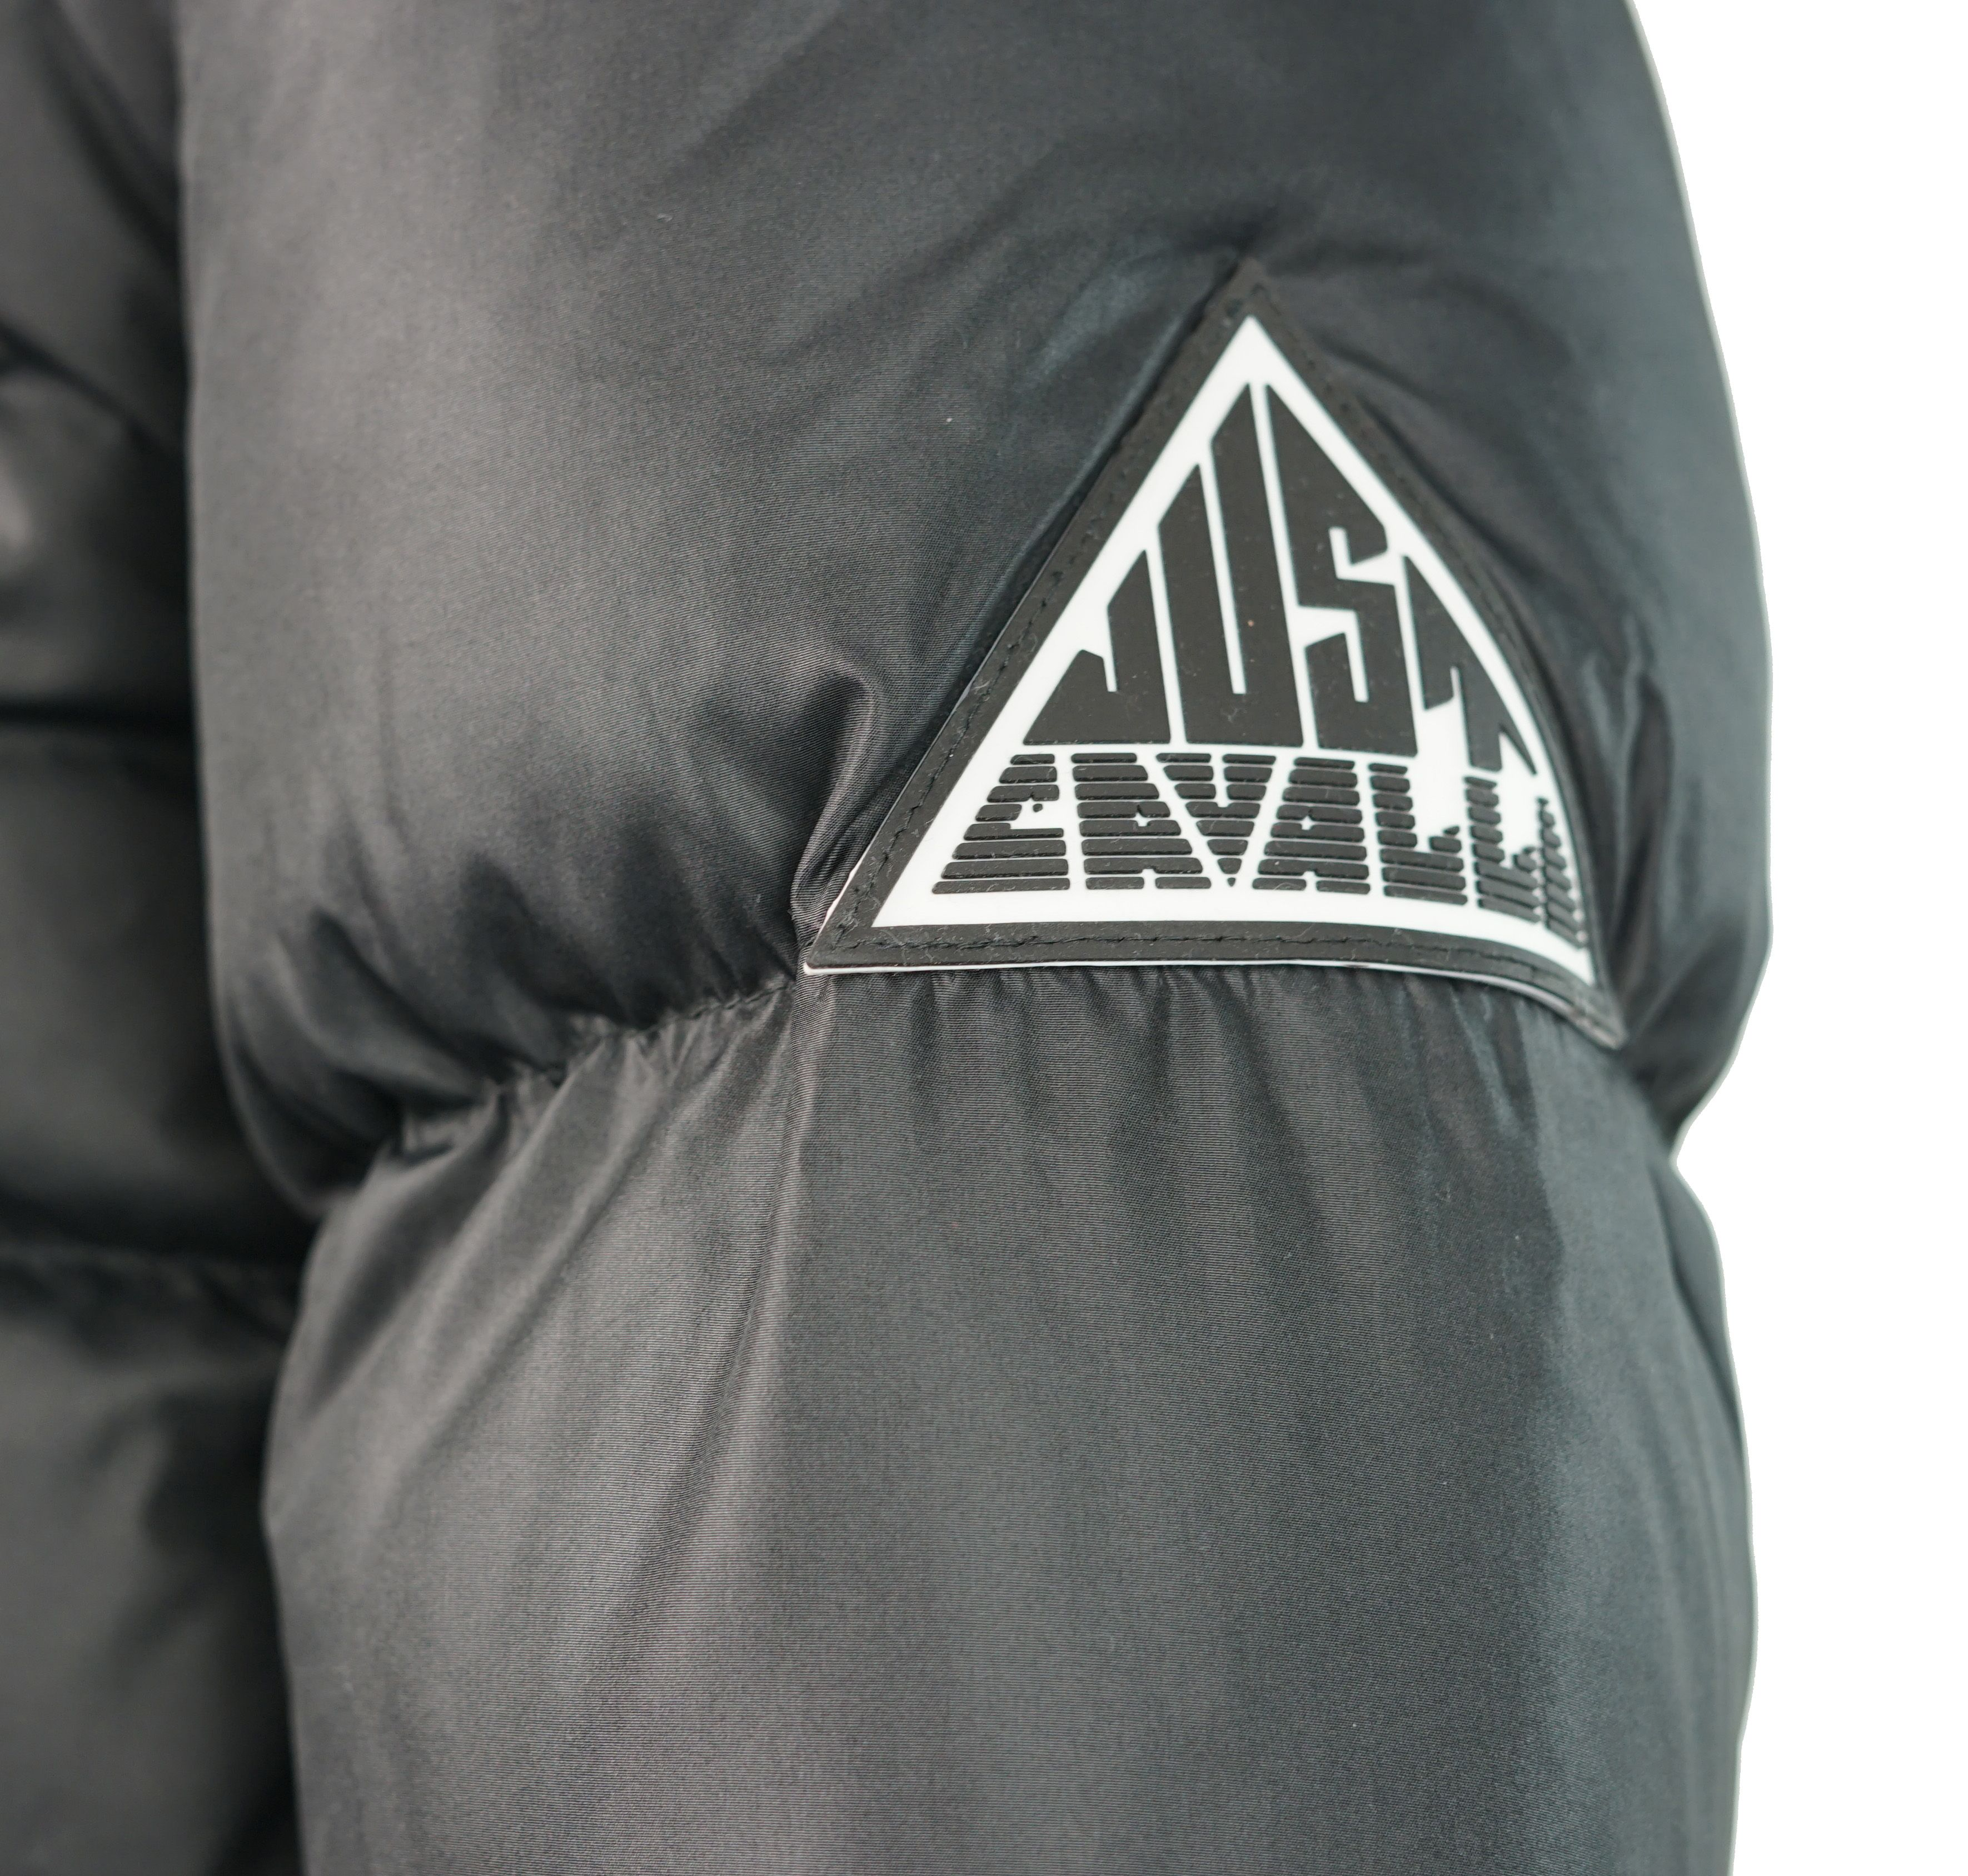 Just Cavalli S03AM0294 N39378 900 Jacket